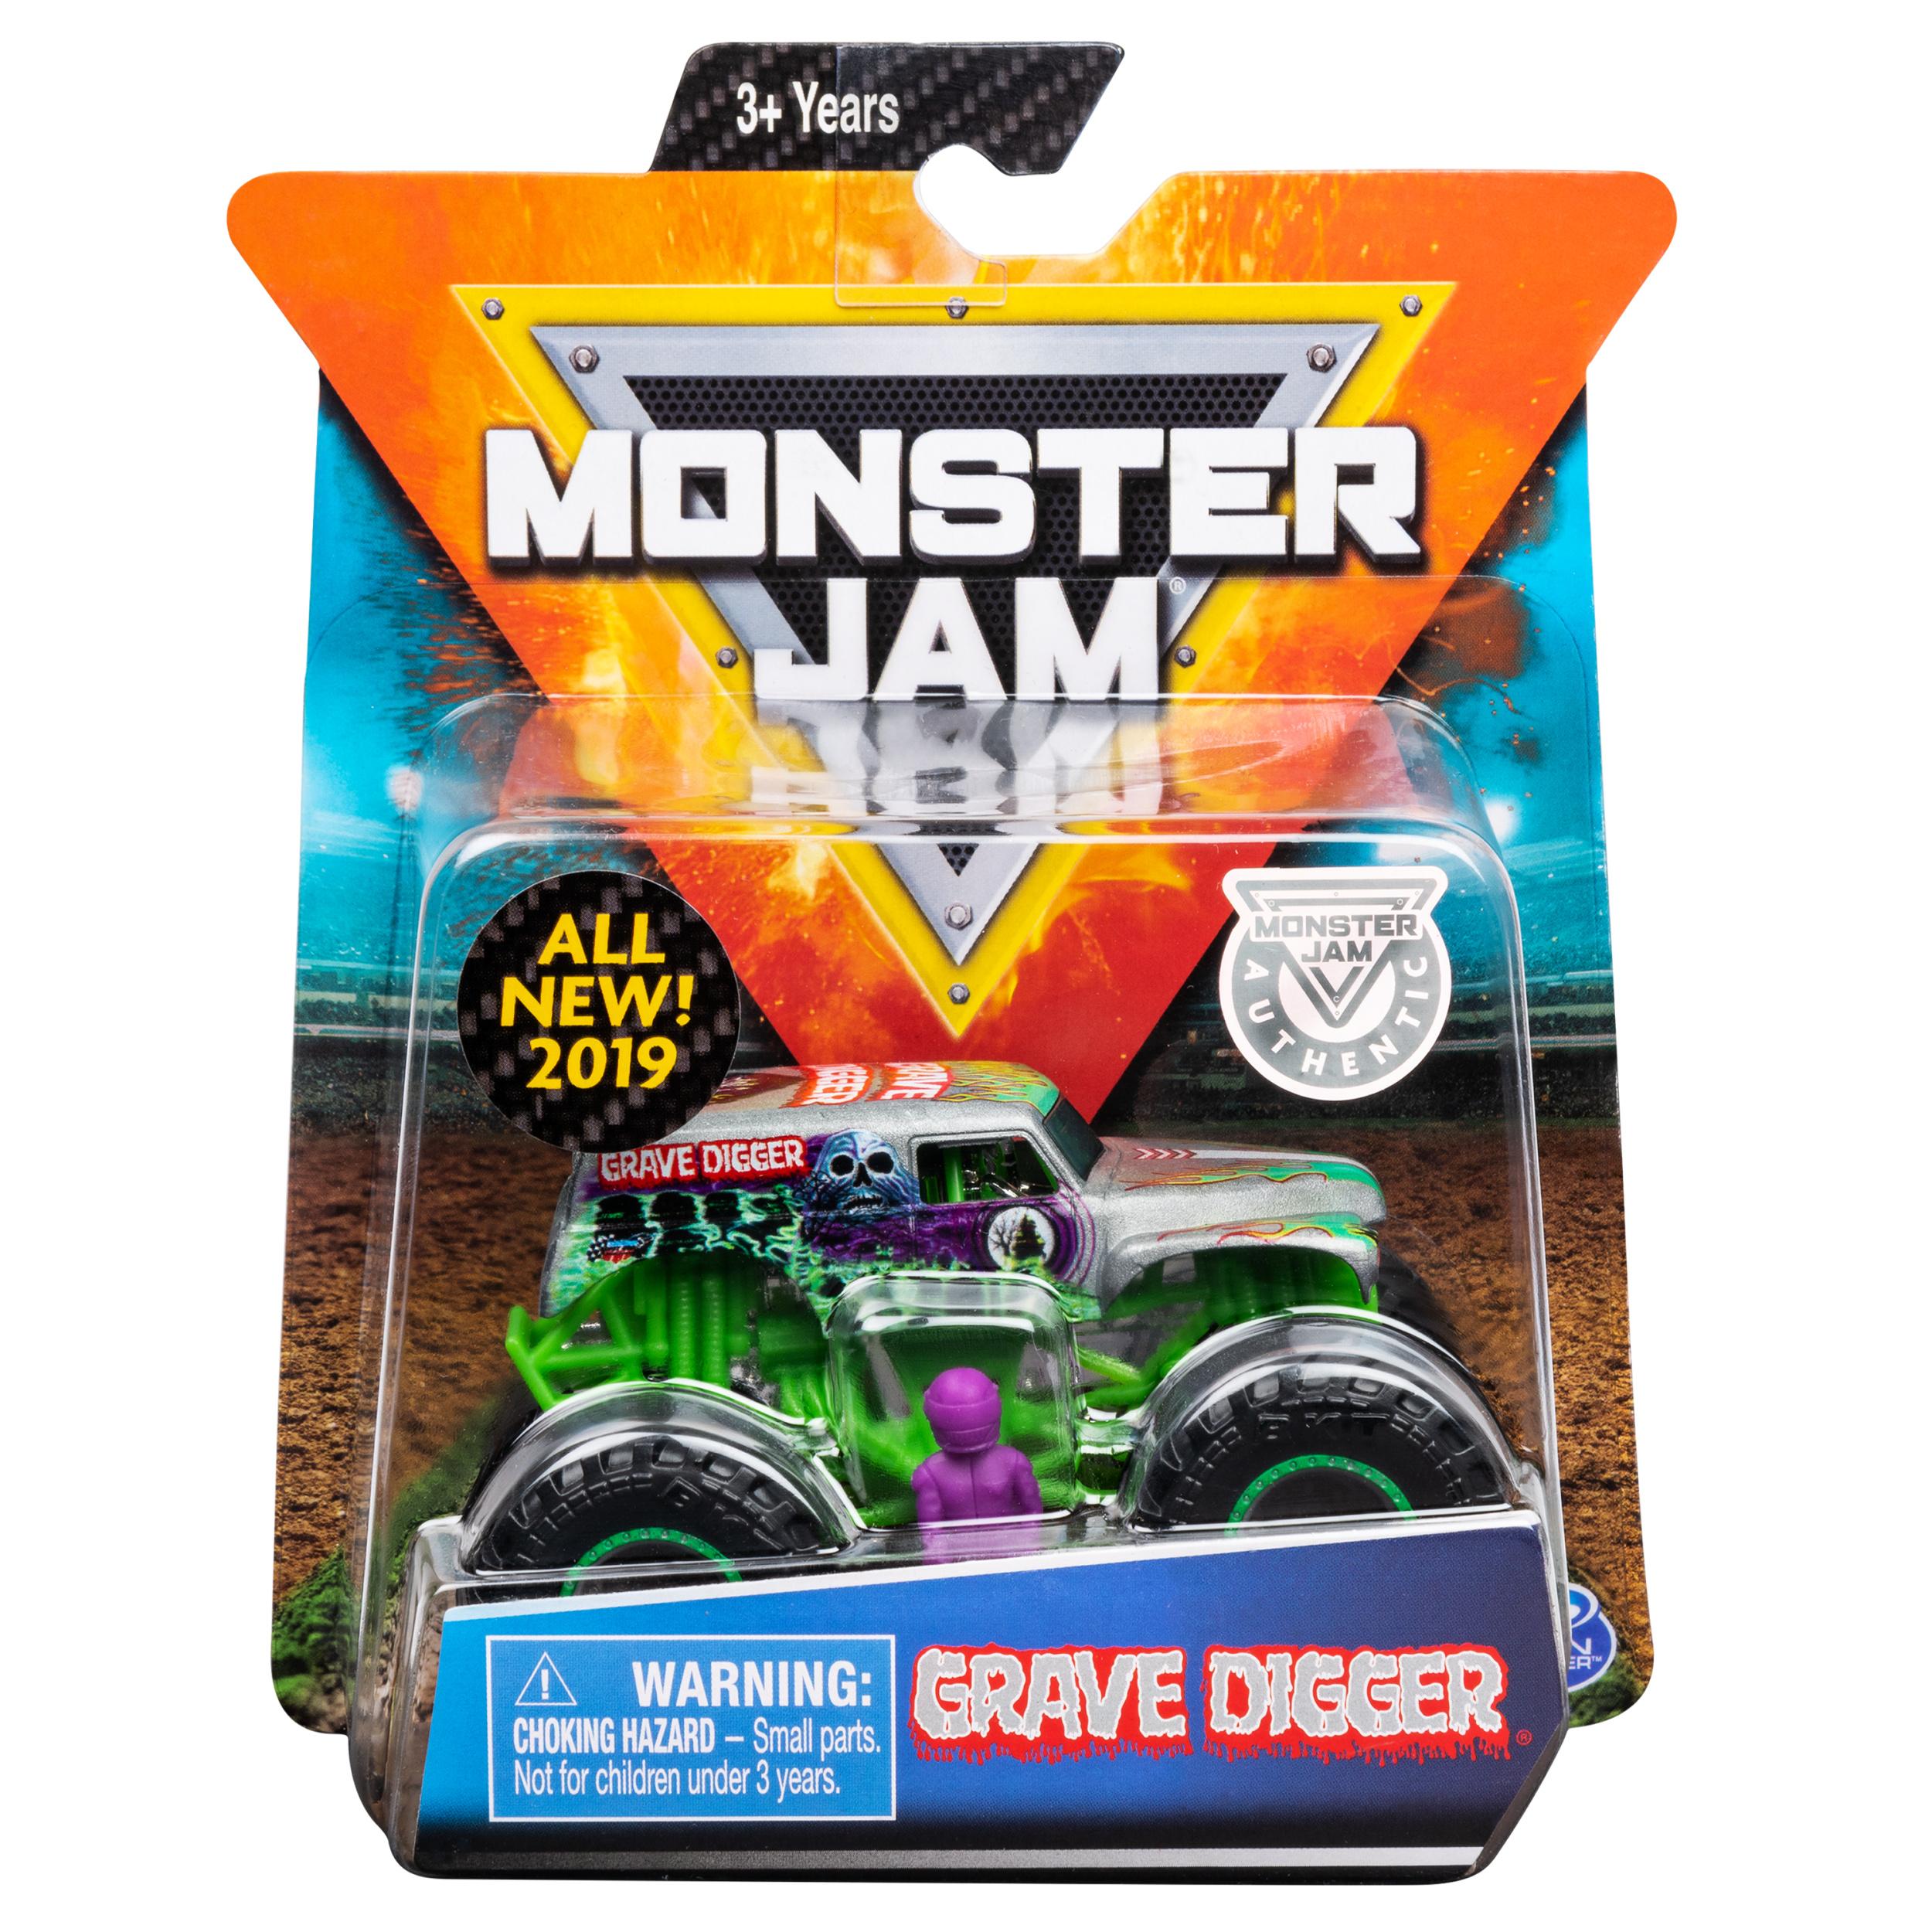 Monster Jam, Official Grave Digger Monster Truck, Die-Cast Vehicle, Arena Favorites Series, 1:64 Scale